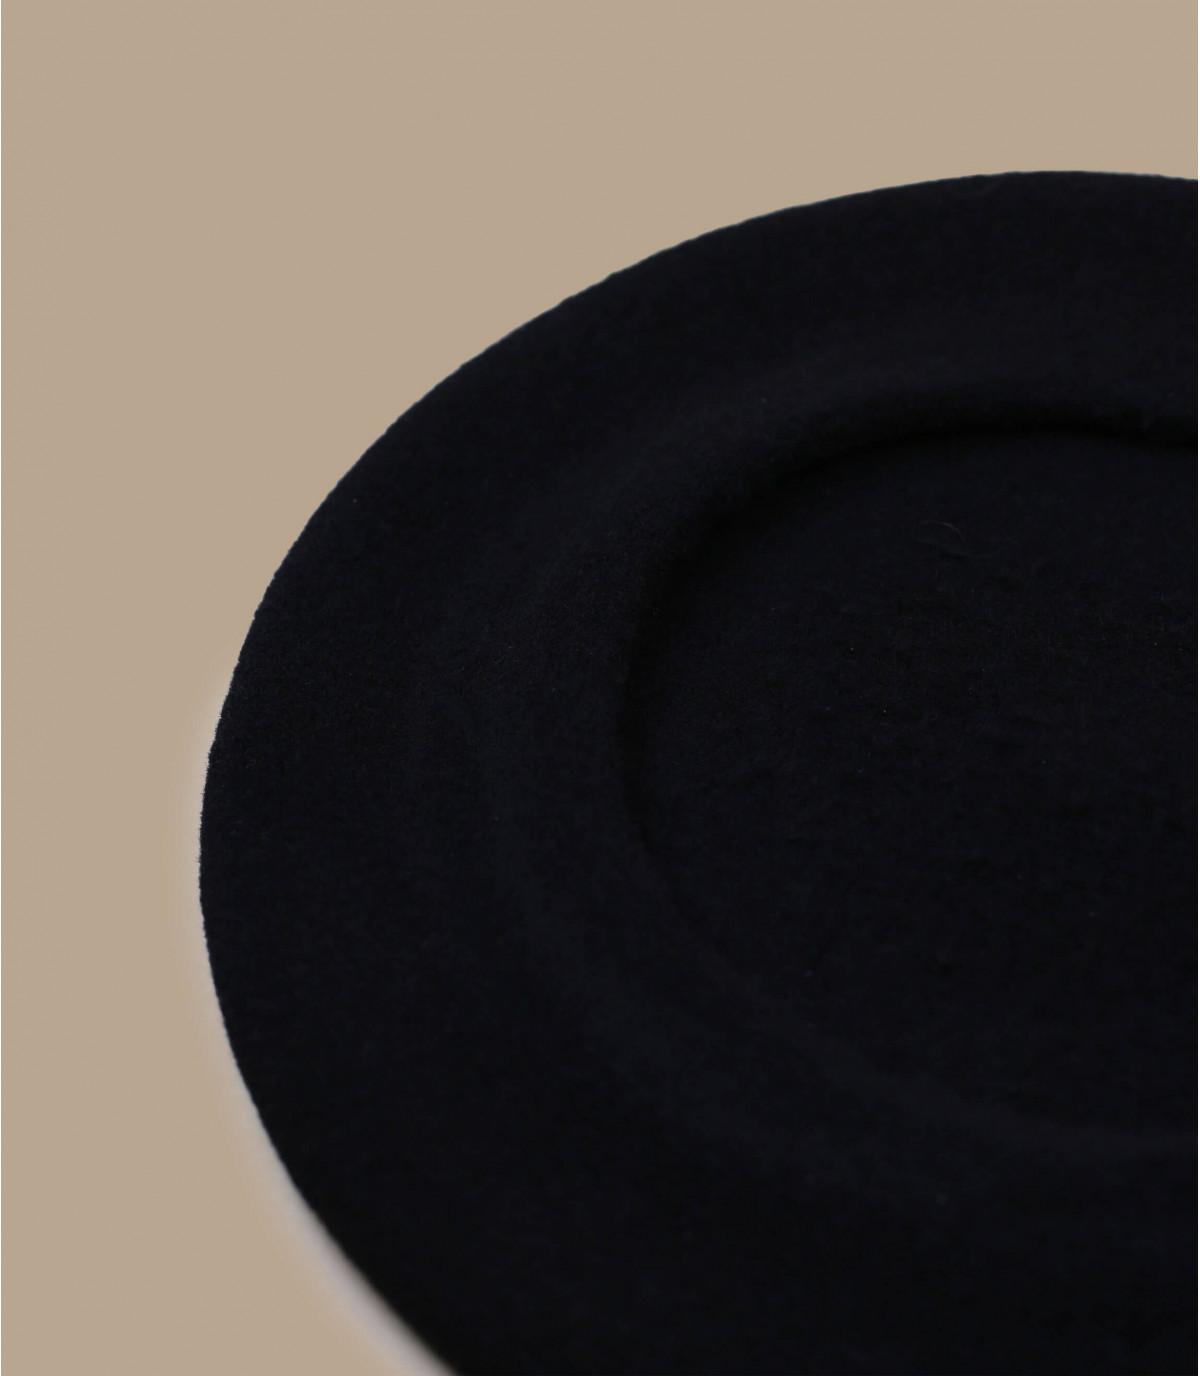 Detalles Boina paris negra imagen 3